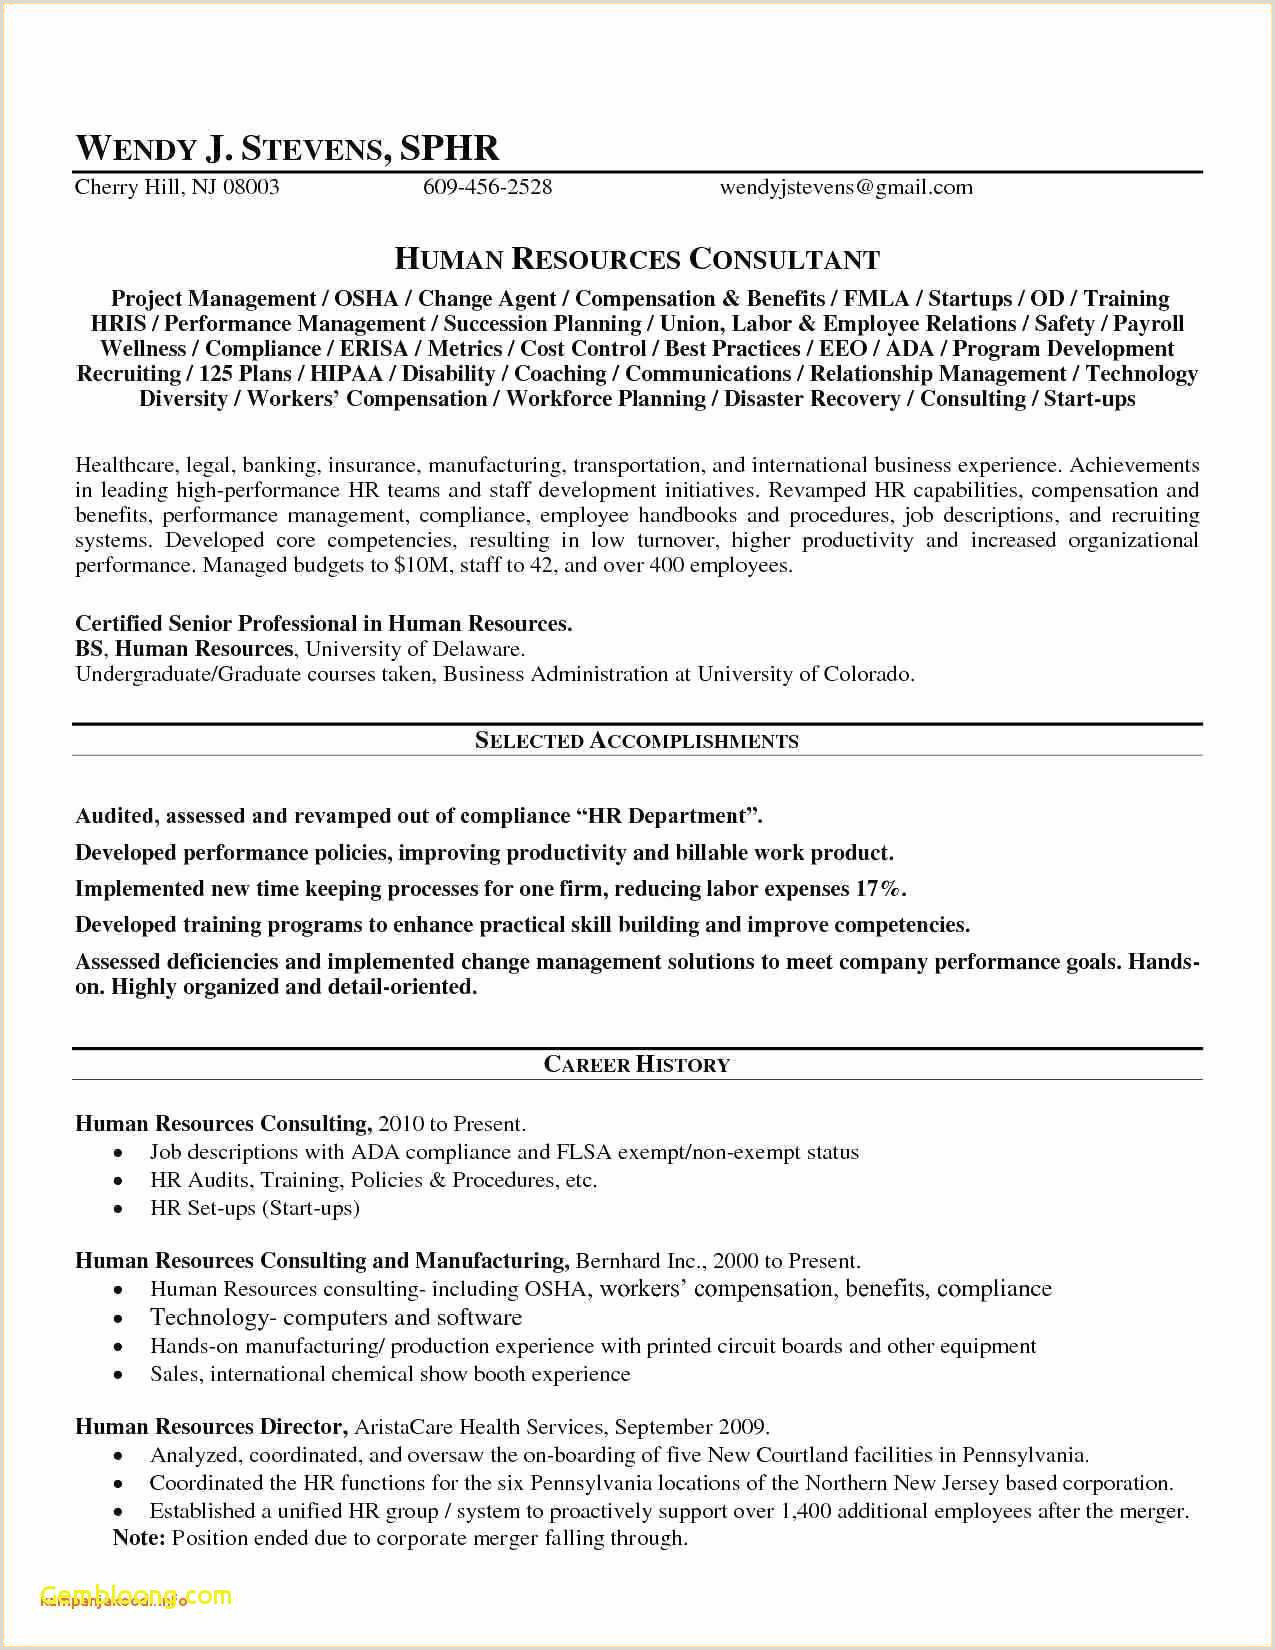 Cv Sample For Legal Jobs Real Estate Assistant Jobescription For Resume Receptionist